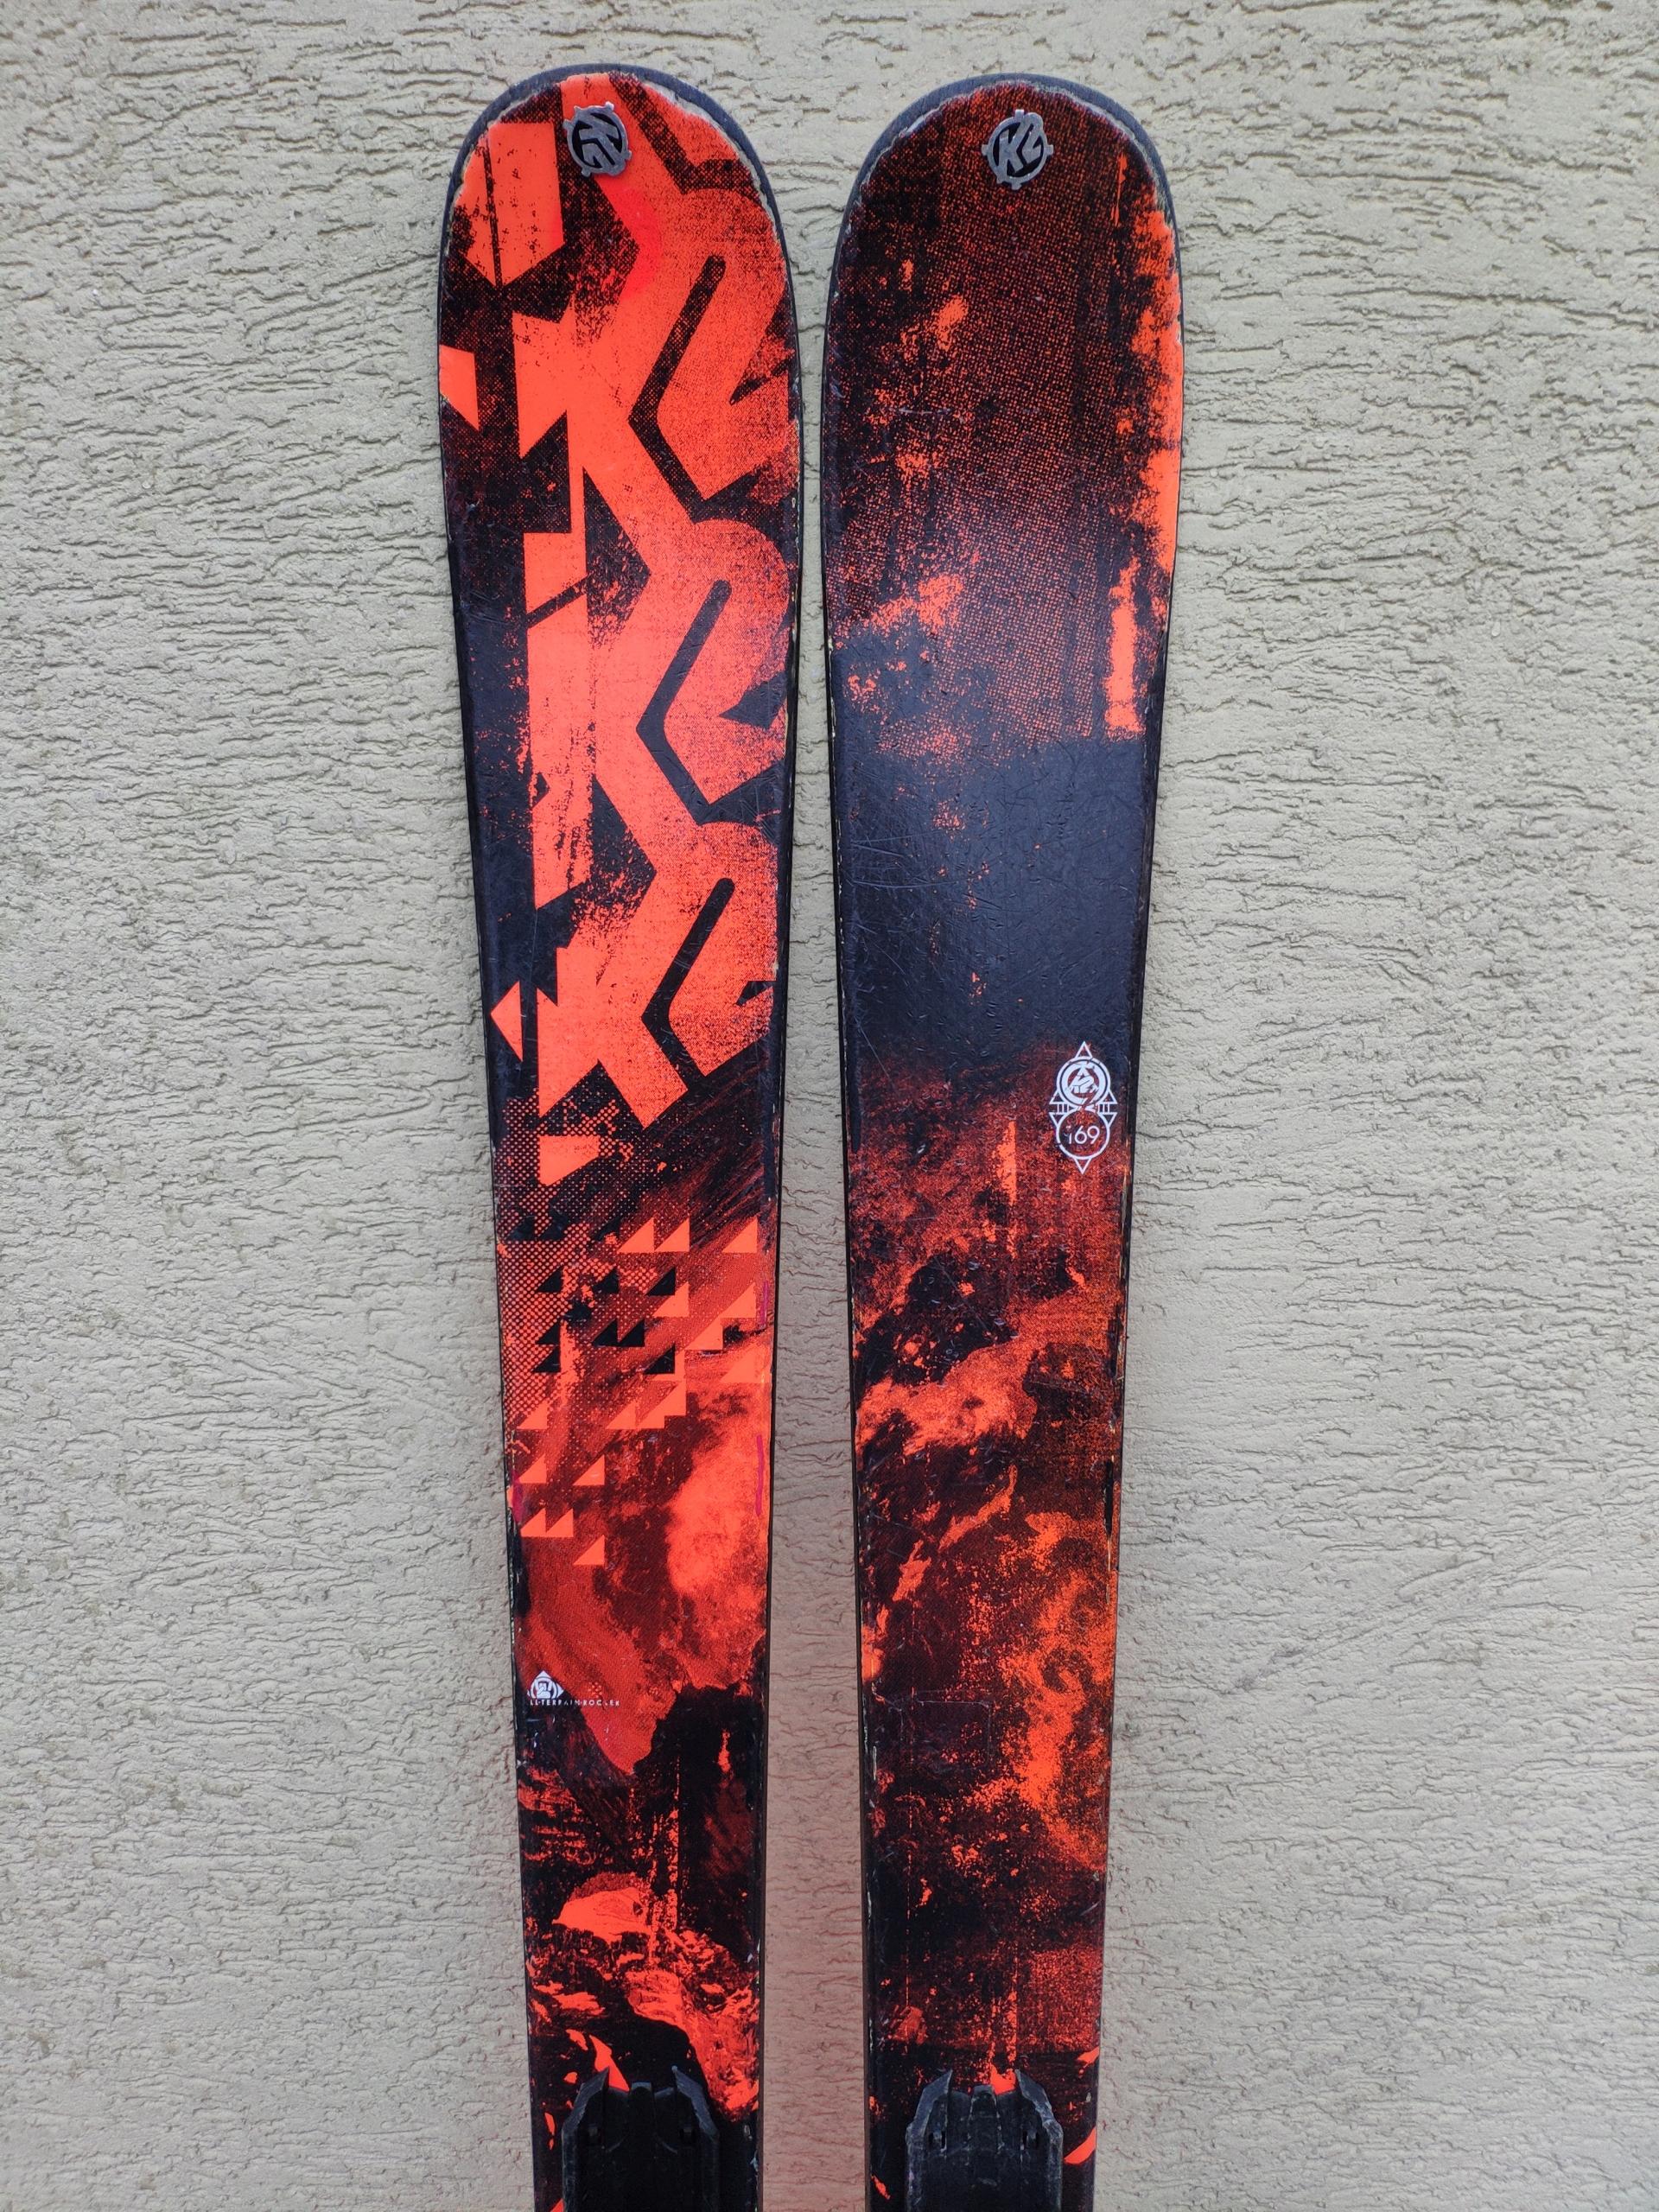 FREESTYLE K2 SIGHT 169 ROCKER GRIFFON WROCLAW 2014